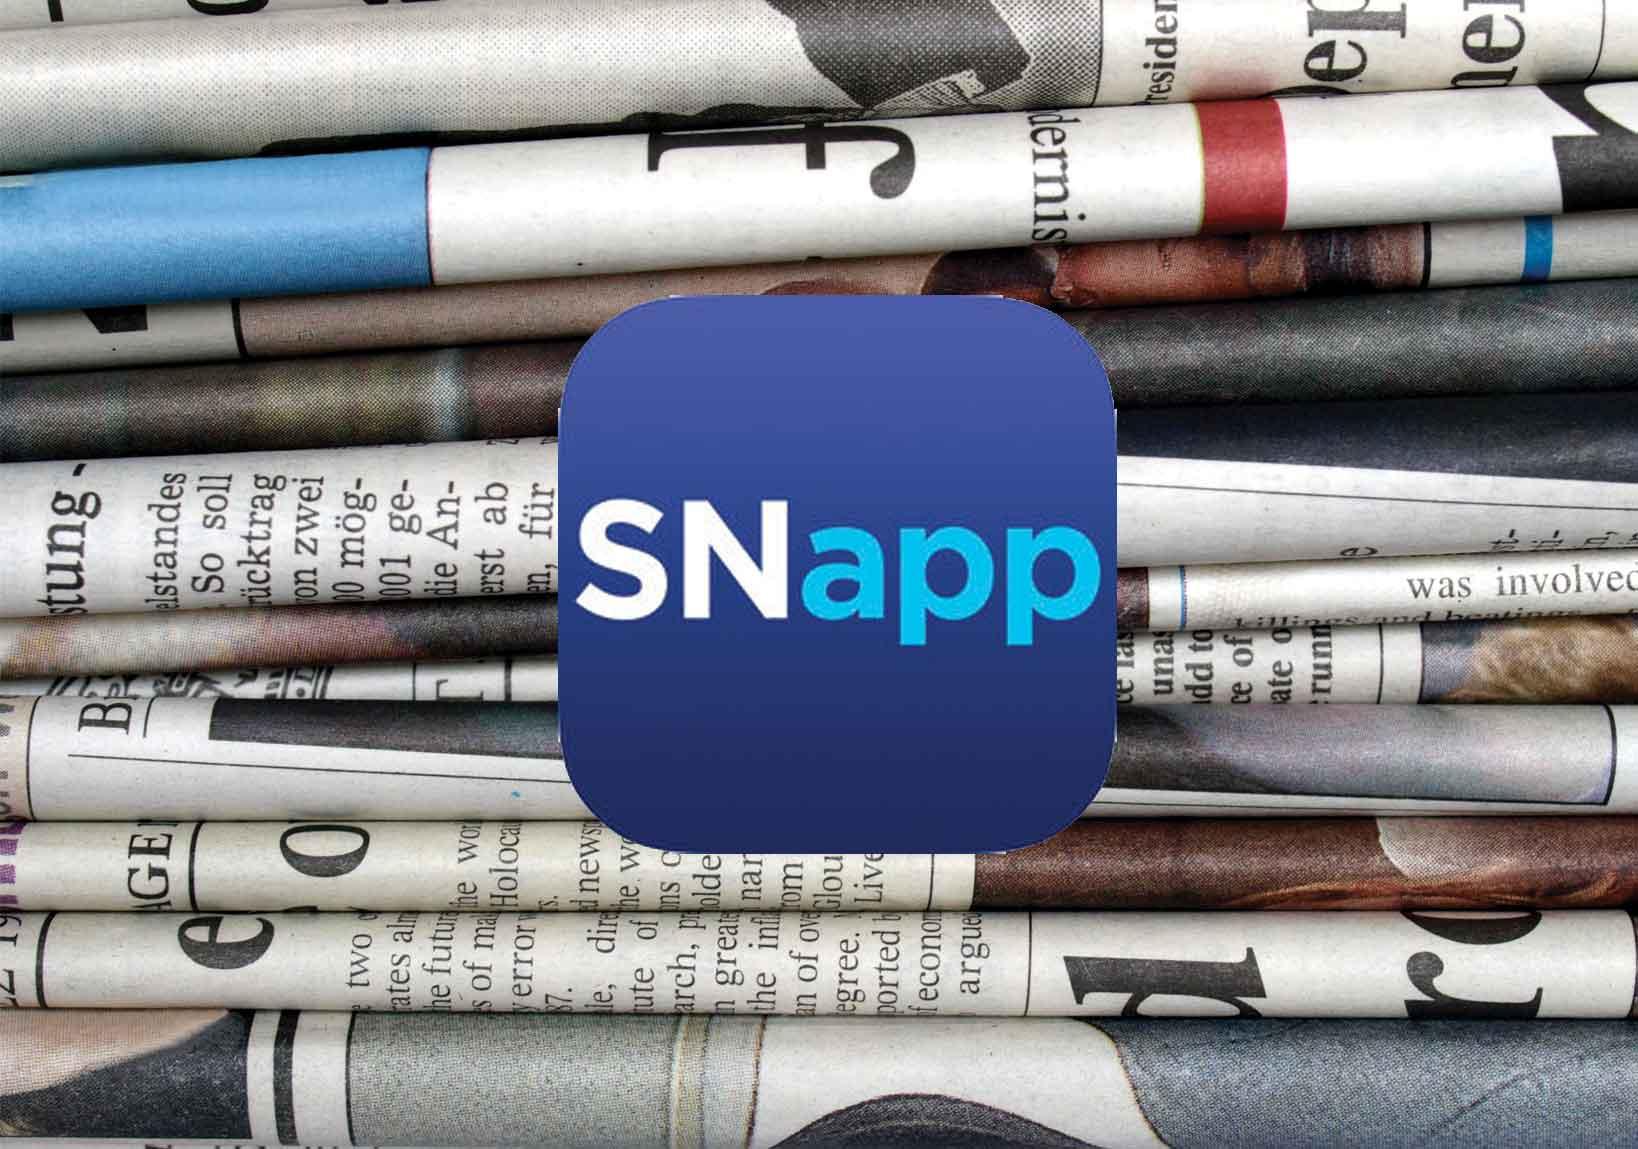 Smiths App - SNapp